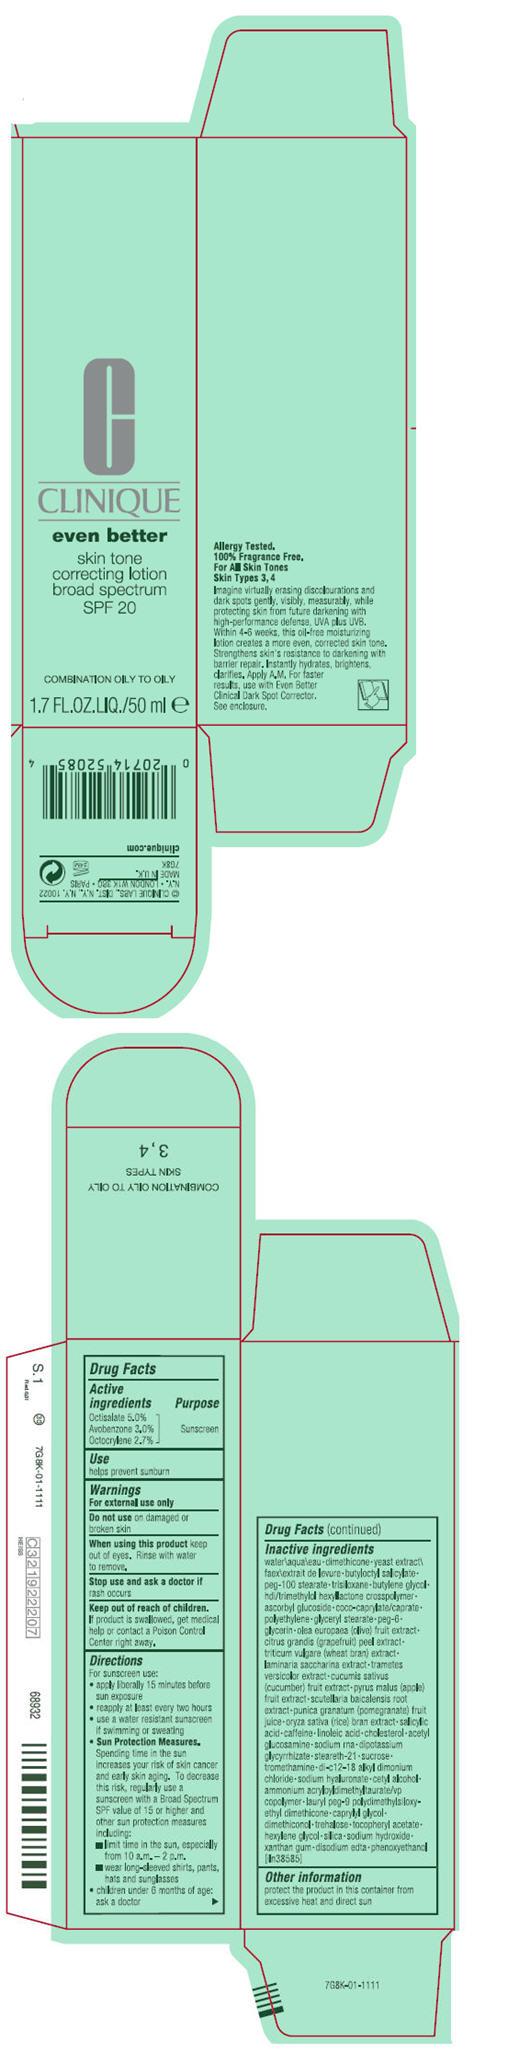 Clinique Even Better Skin Tone Correcting Broad Spectrum Spf 20 (Octisalate, Avobenzone, And Octocrylene) Lotion [Clinique Laboratories Inc.]